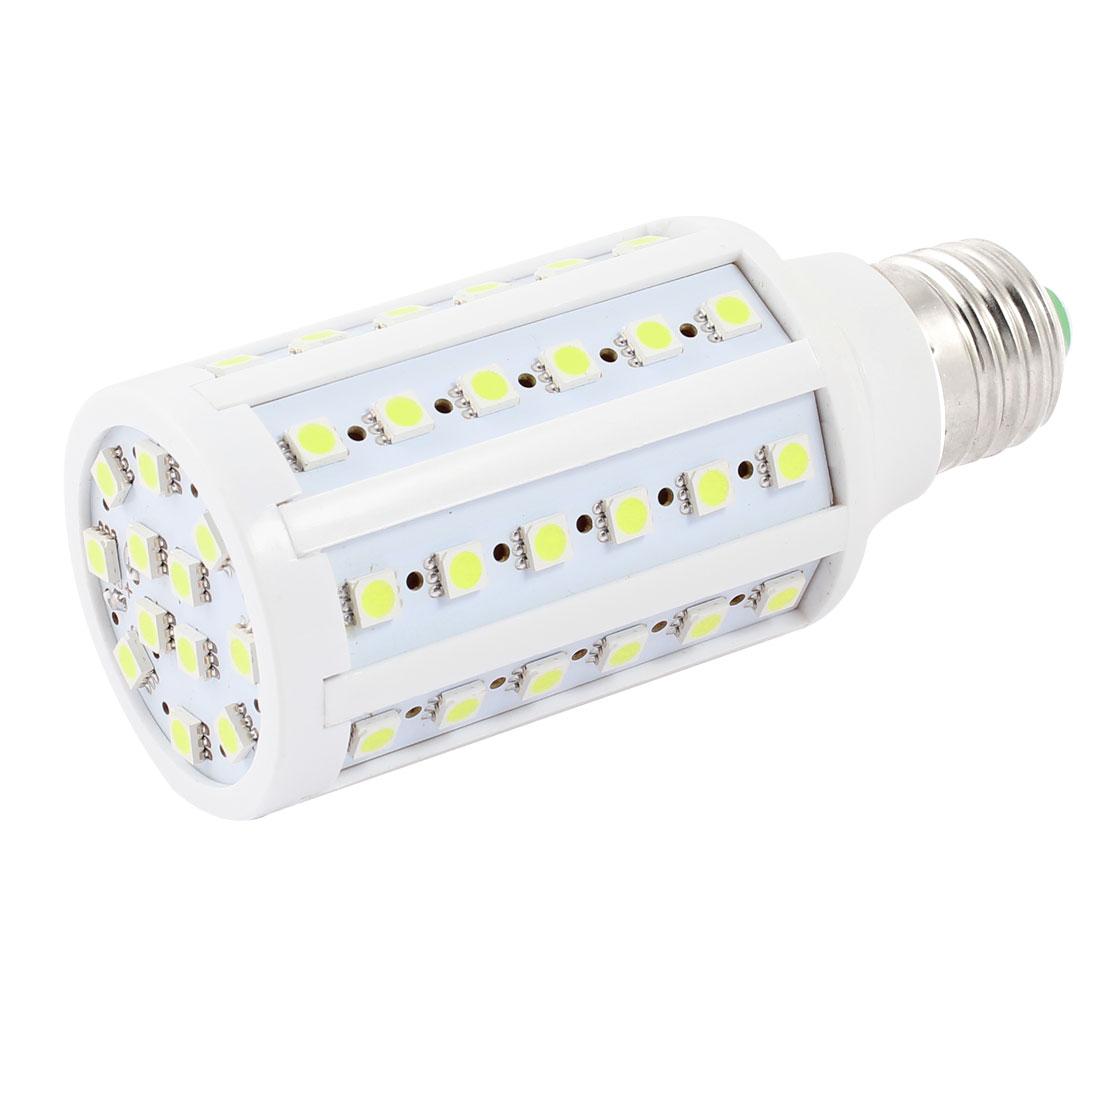 6000-6500K 12W Watt E27 Screw Base Pure White 60 SMD 5050 LED Light Bulb Lamp